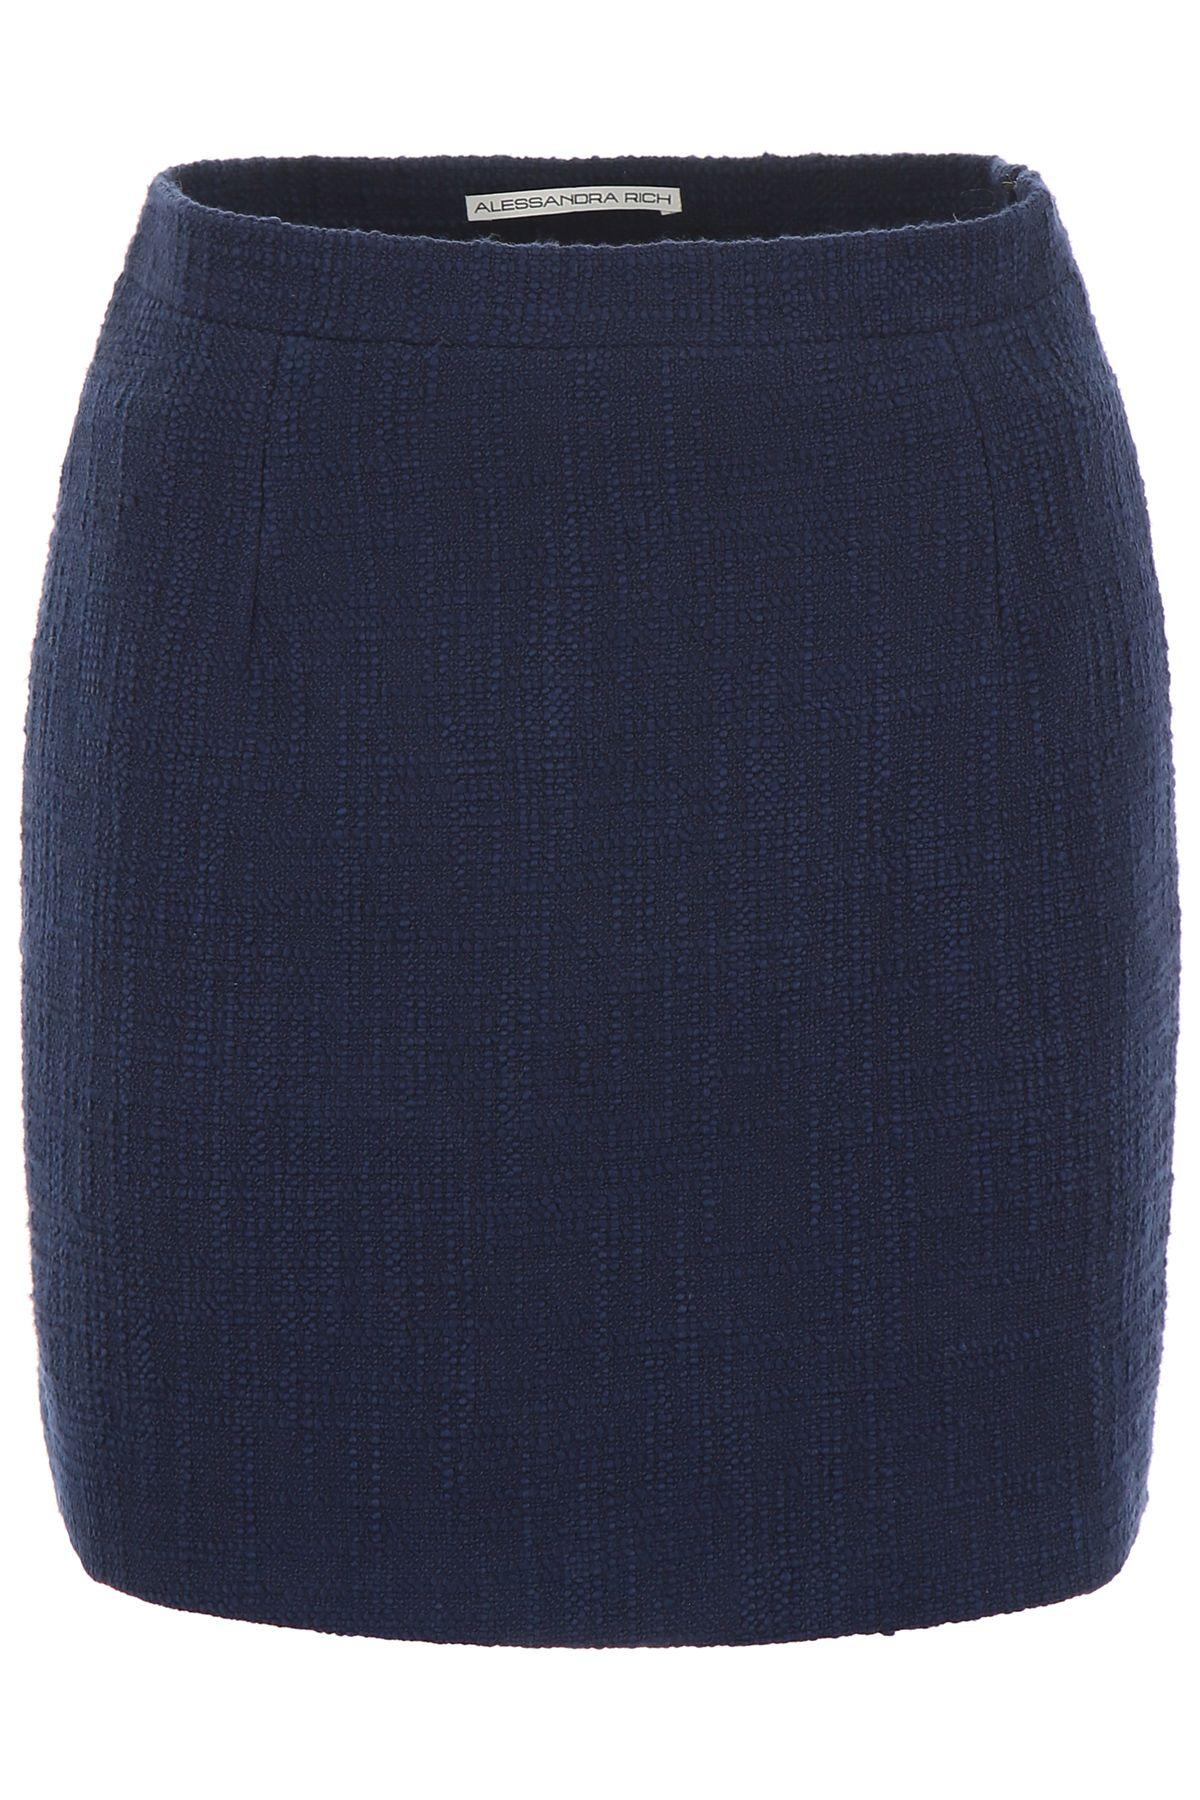 Alessandra Rich Skirts TWEED SKIRT